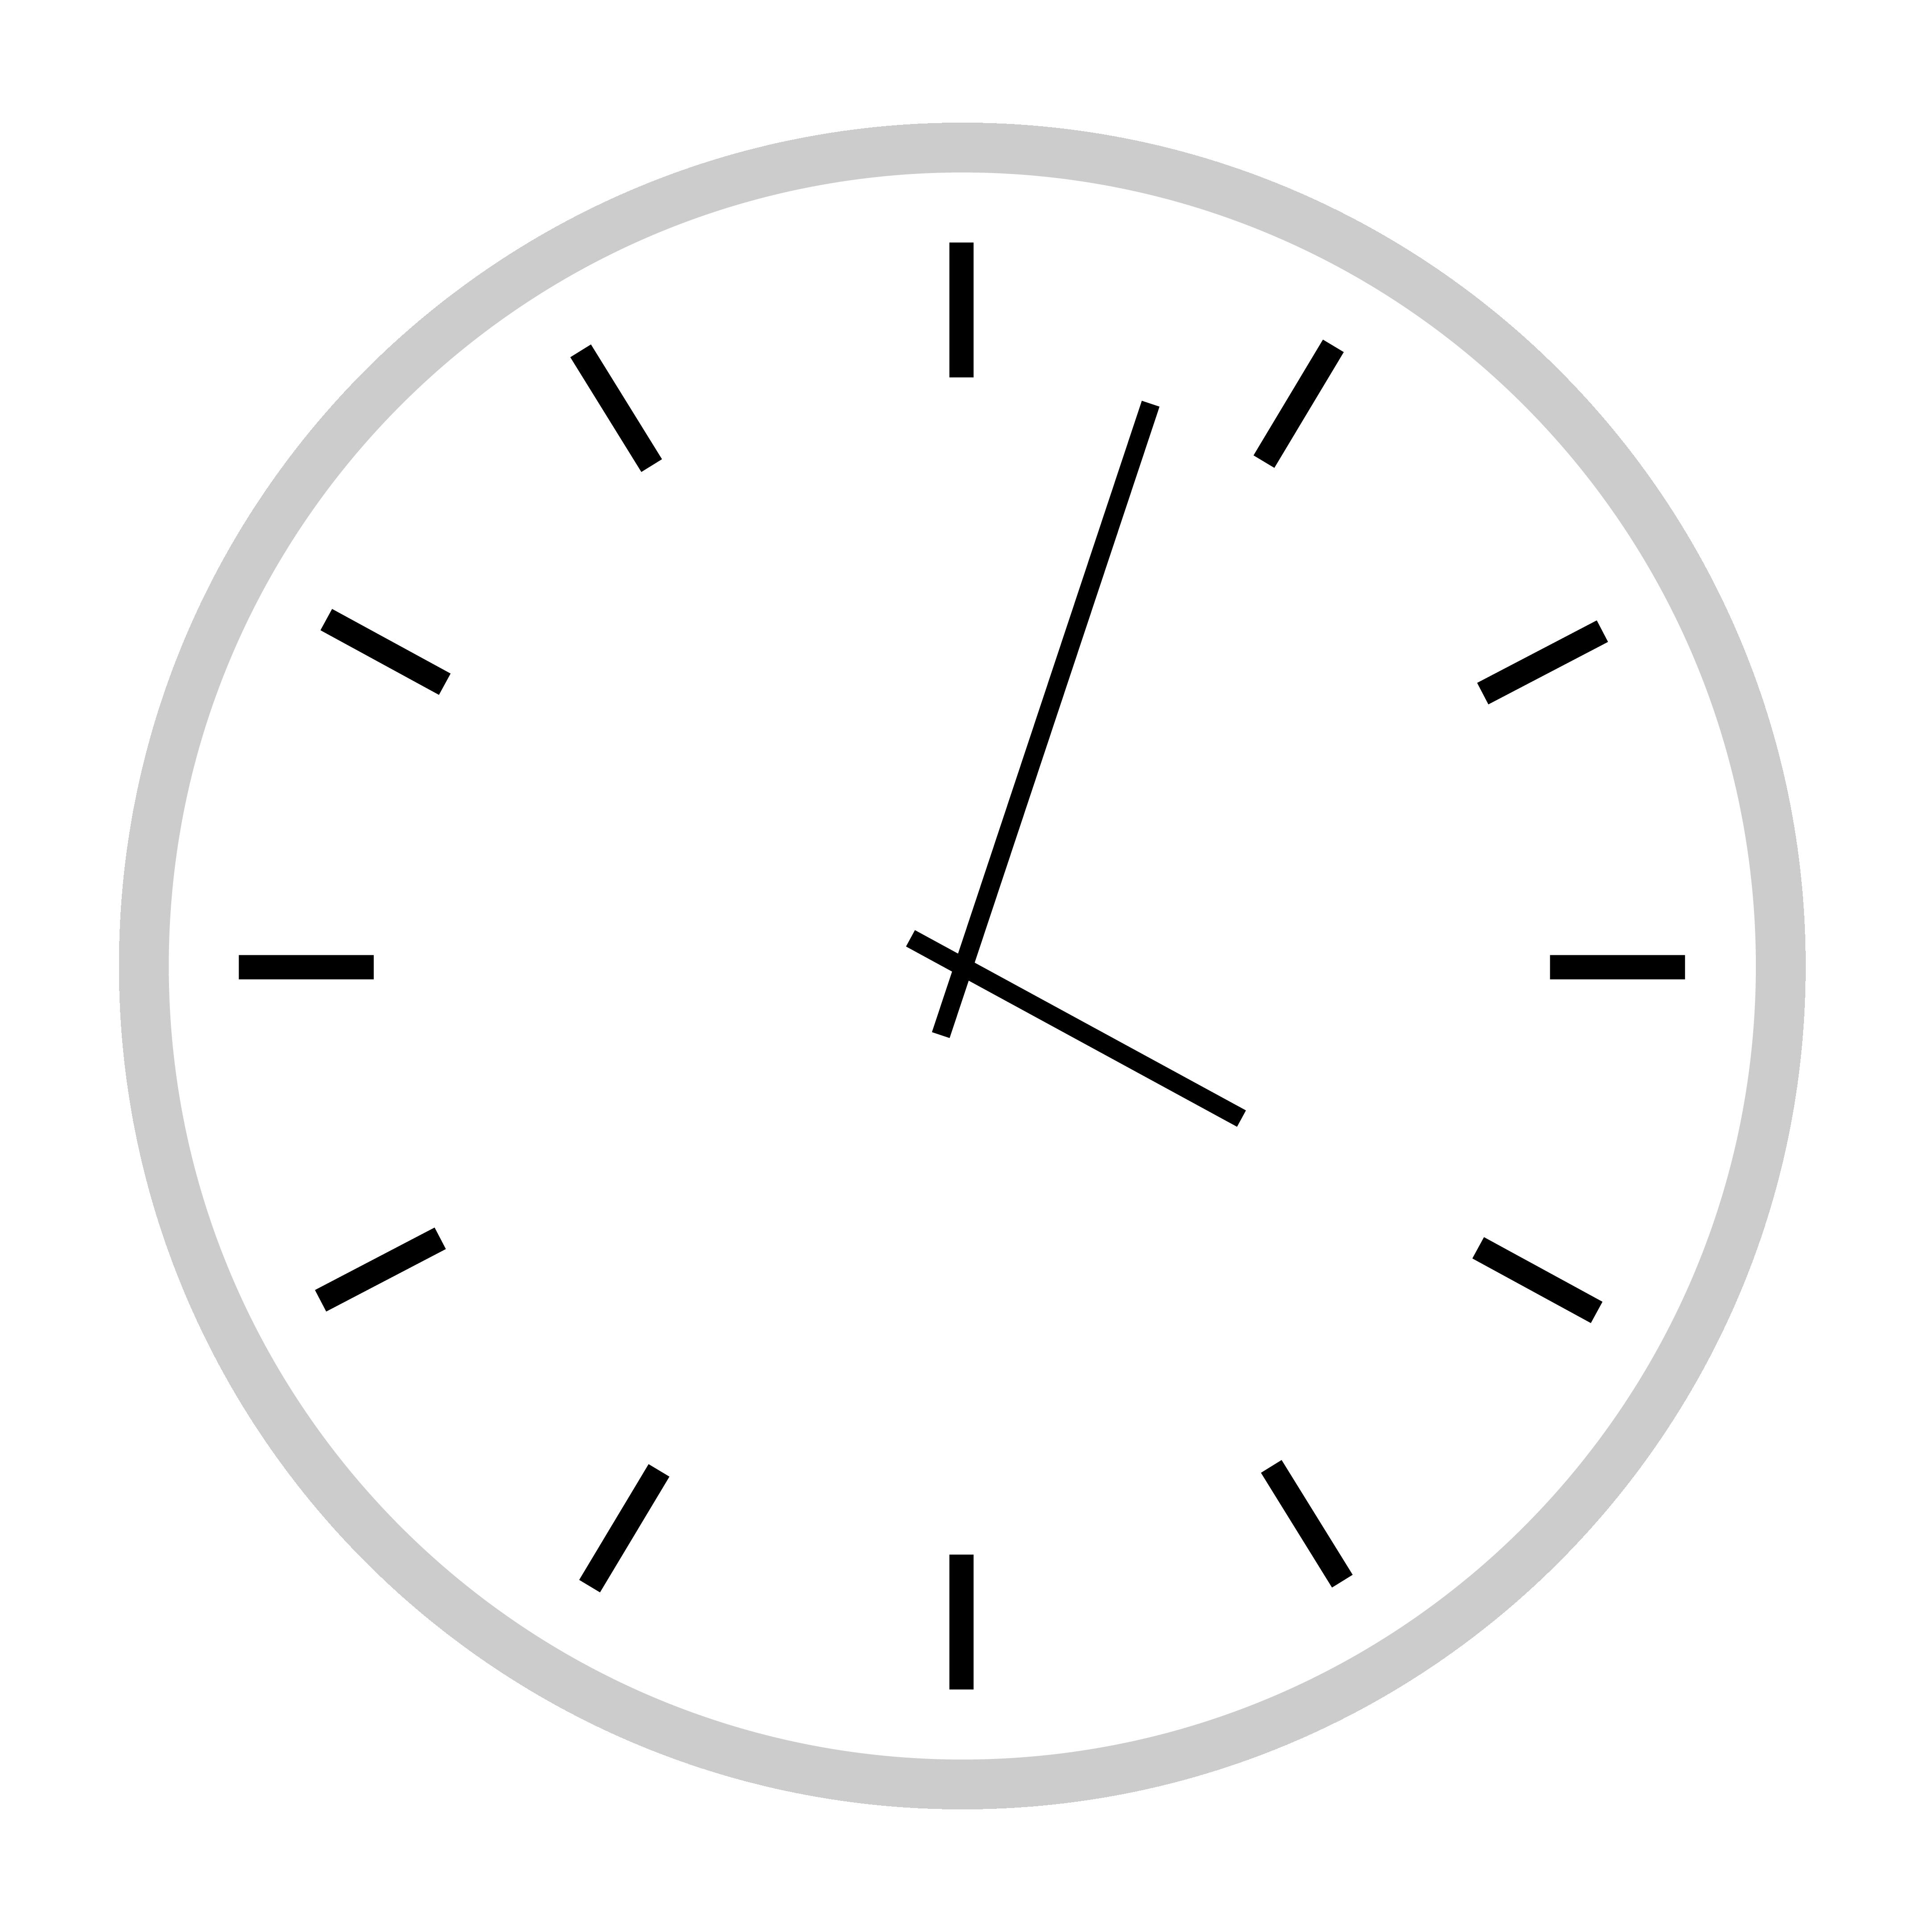 Clocks-Time-03.png